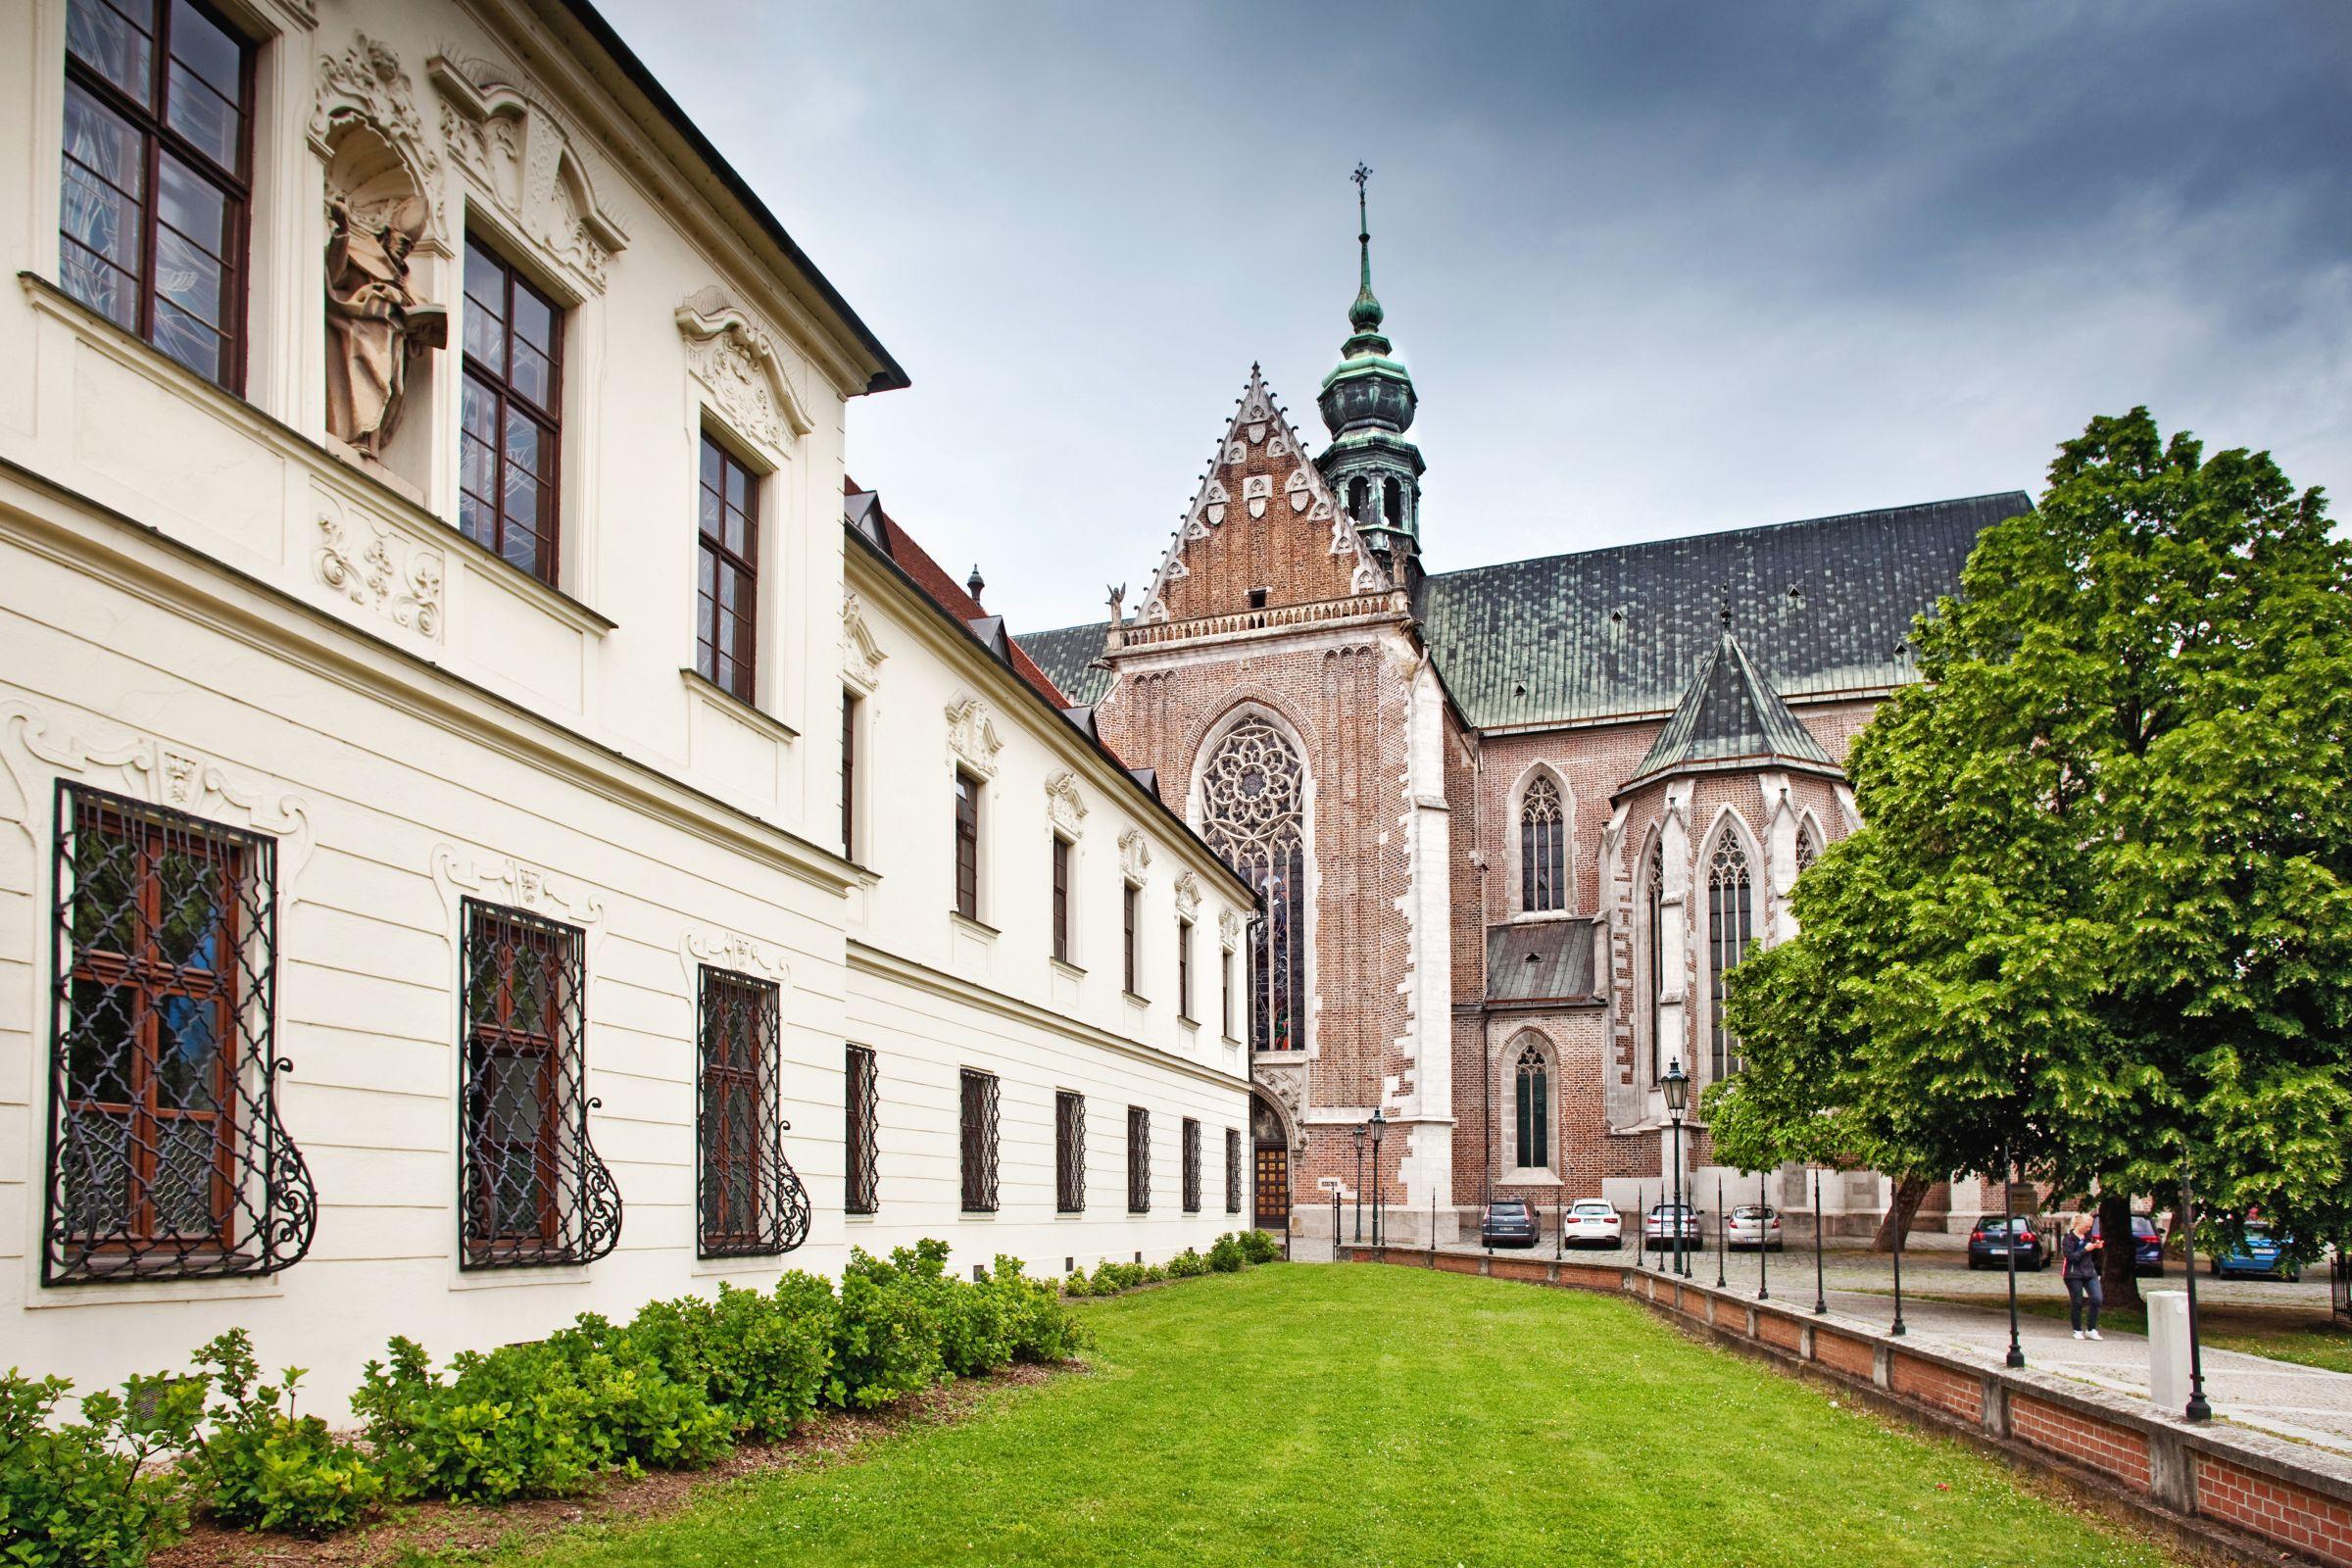 Basilica of the Assumption of Our Lady (Bazilika Nanebevzetí Panny Marie) in Brno